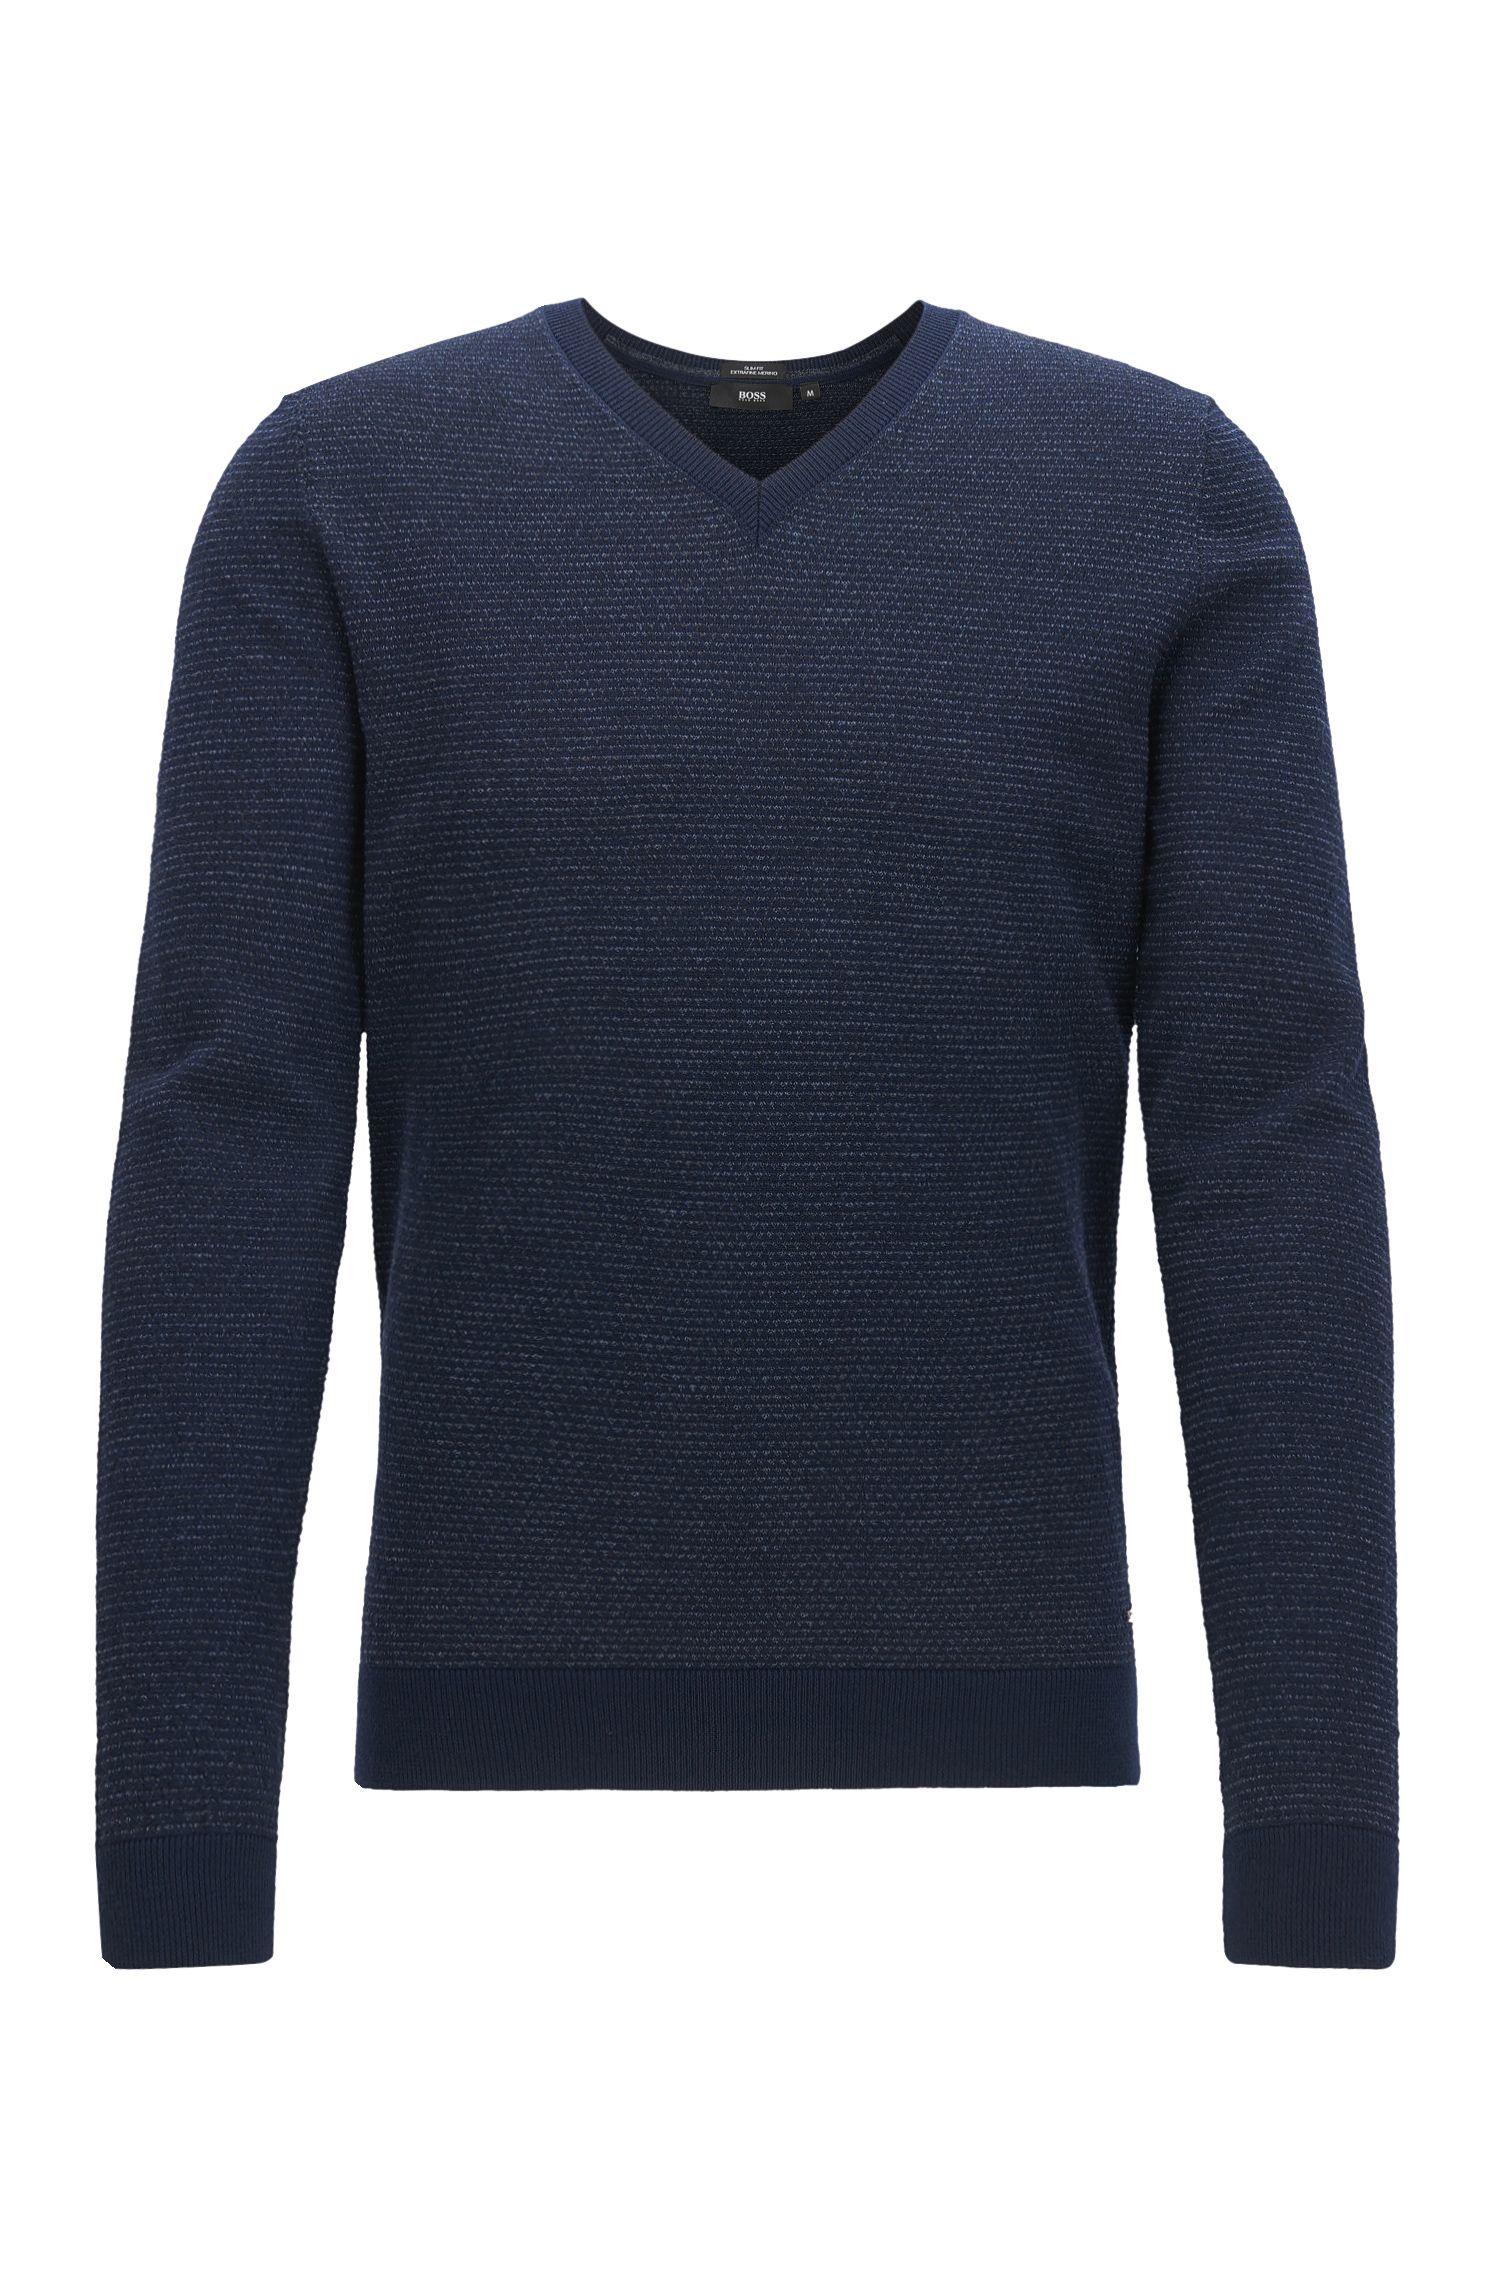 V-neck sweater in mulesing-free virgin wool